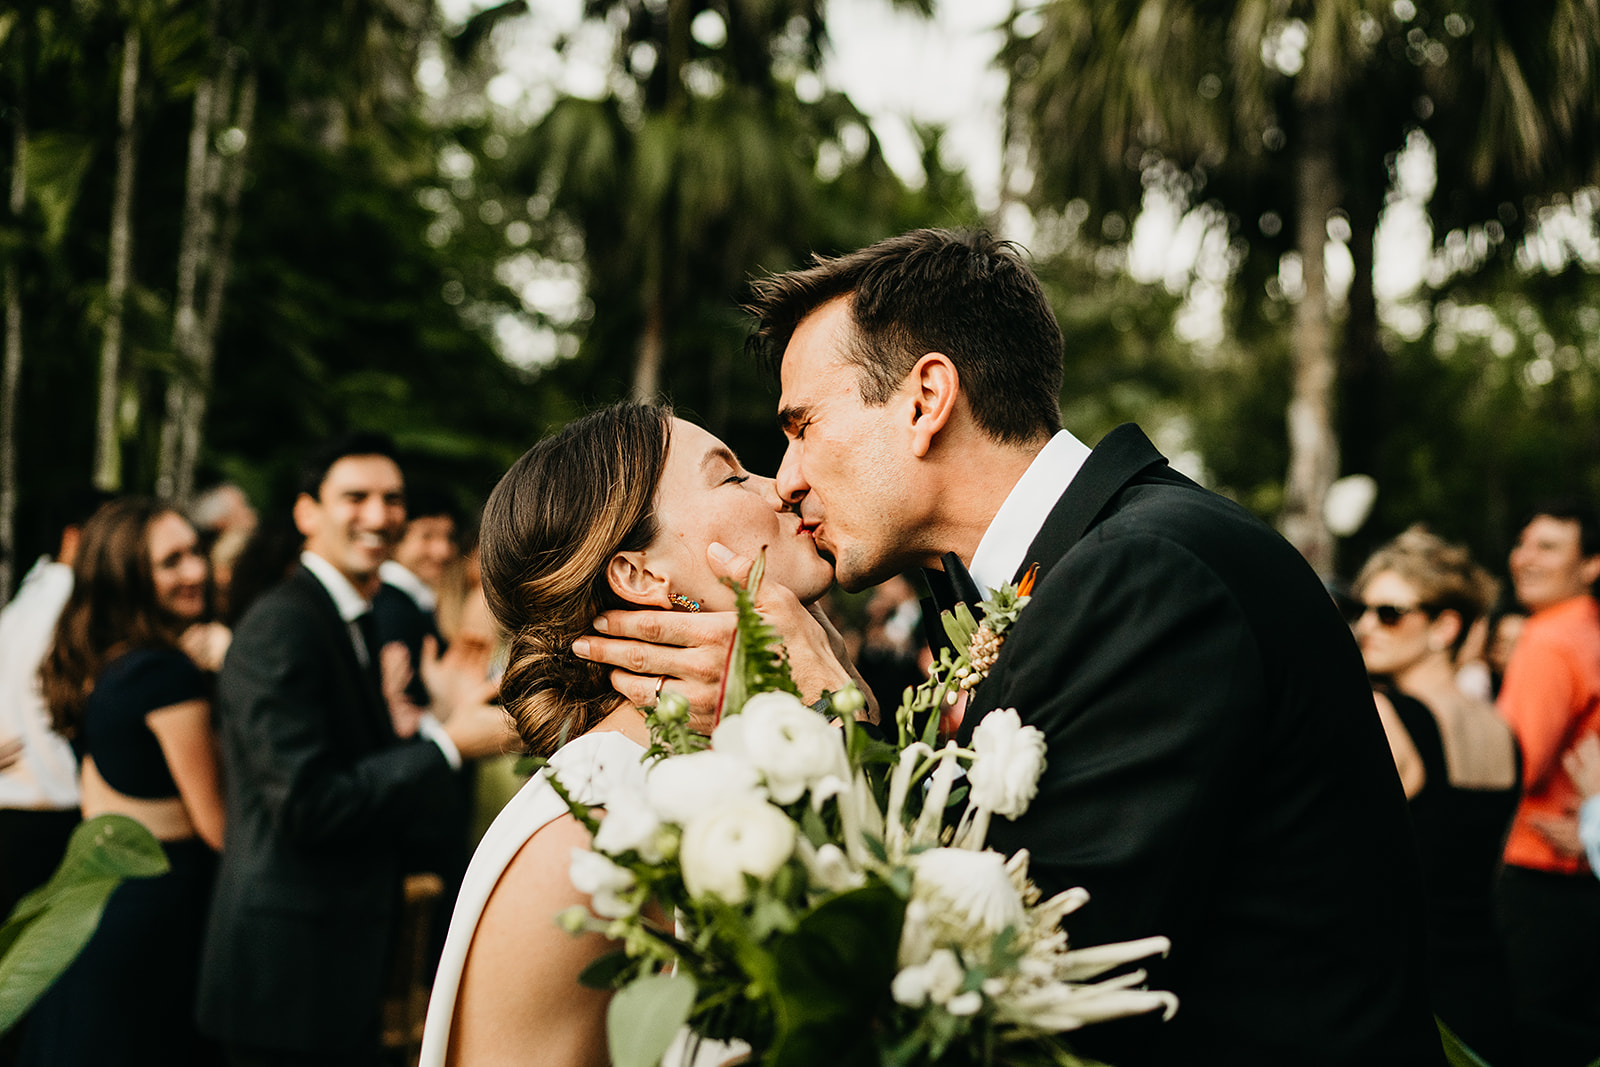 AmandaMarkus-Hacienda-Sac-Chich-Merida-Wedding-616_websize.jpg